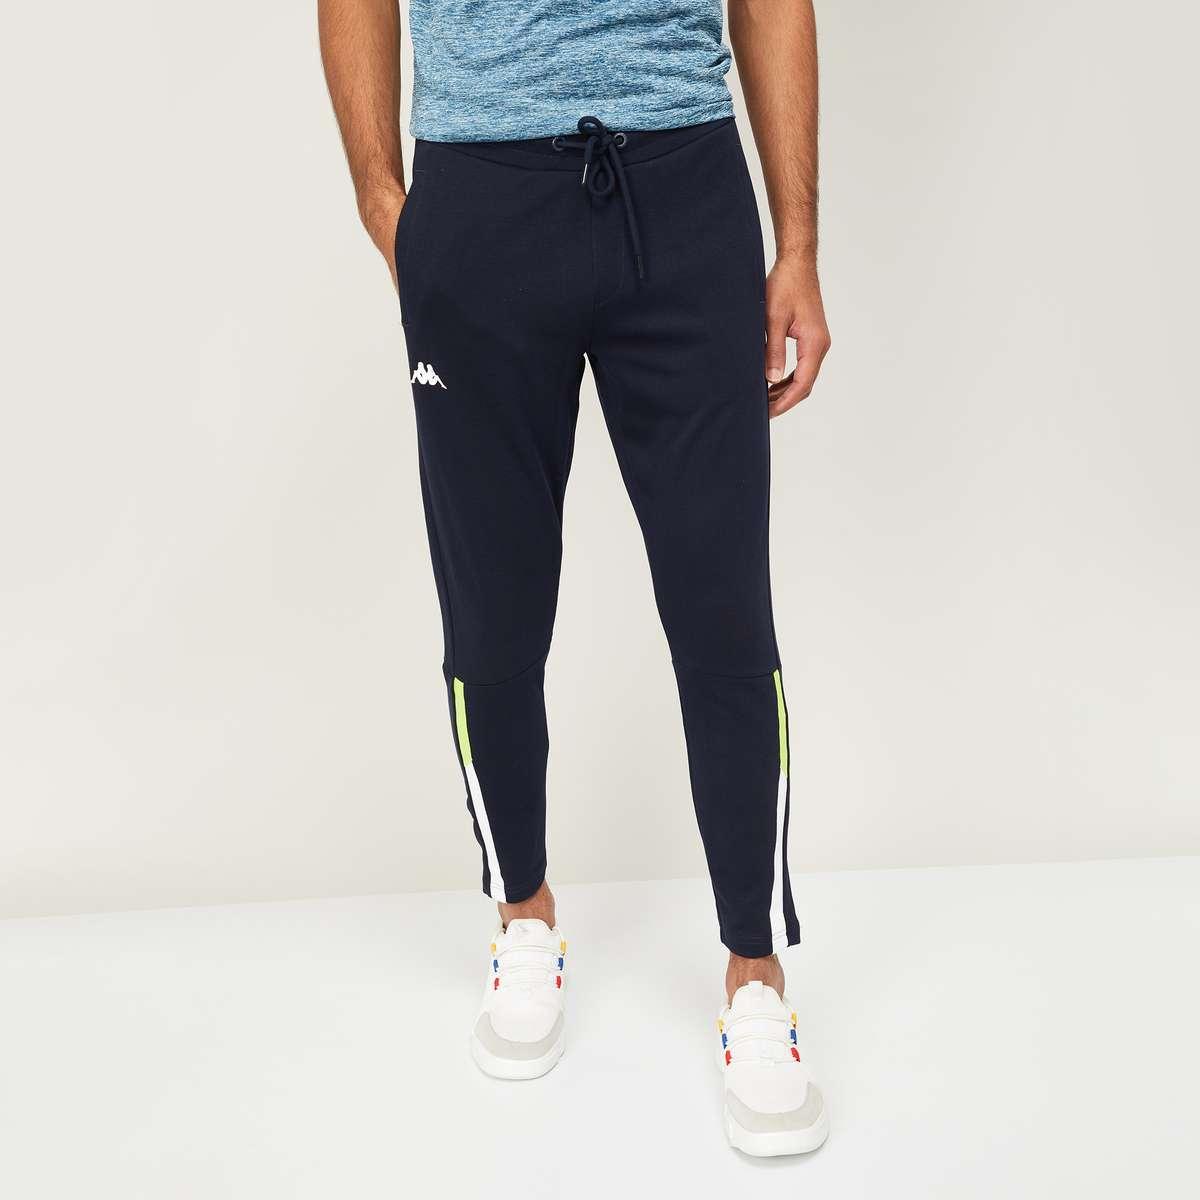 2.KAPPA Men Solid Slim Fit Joggers